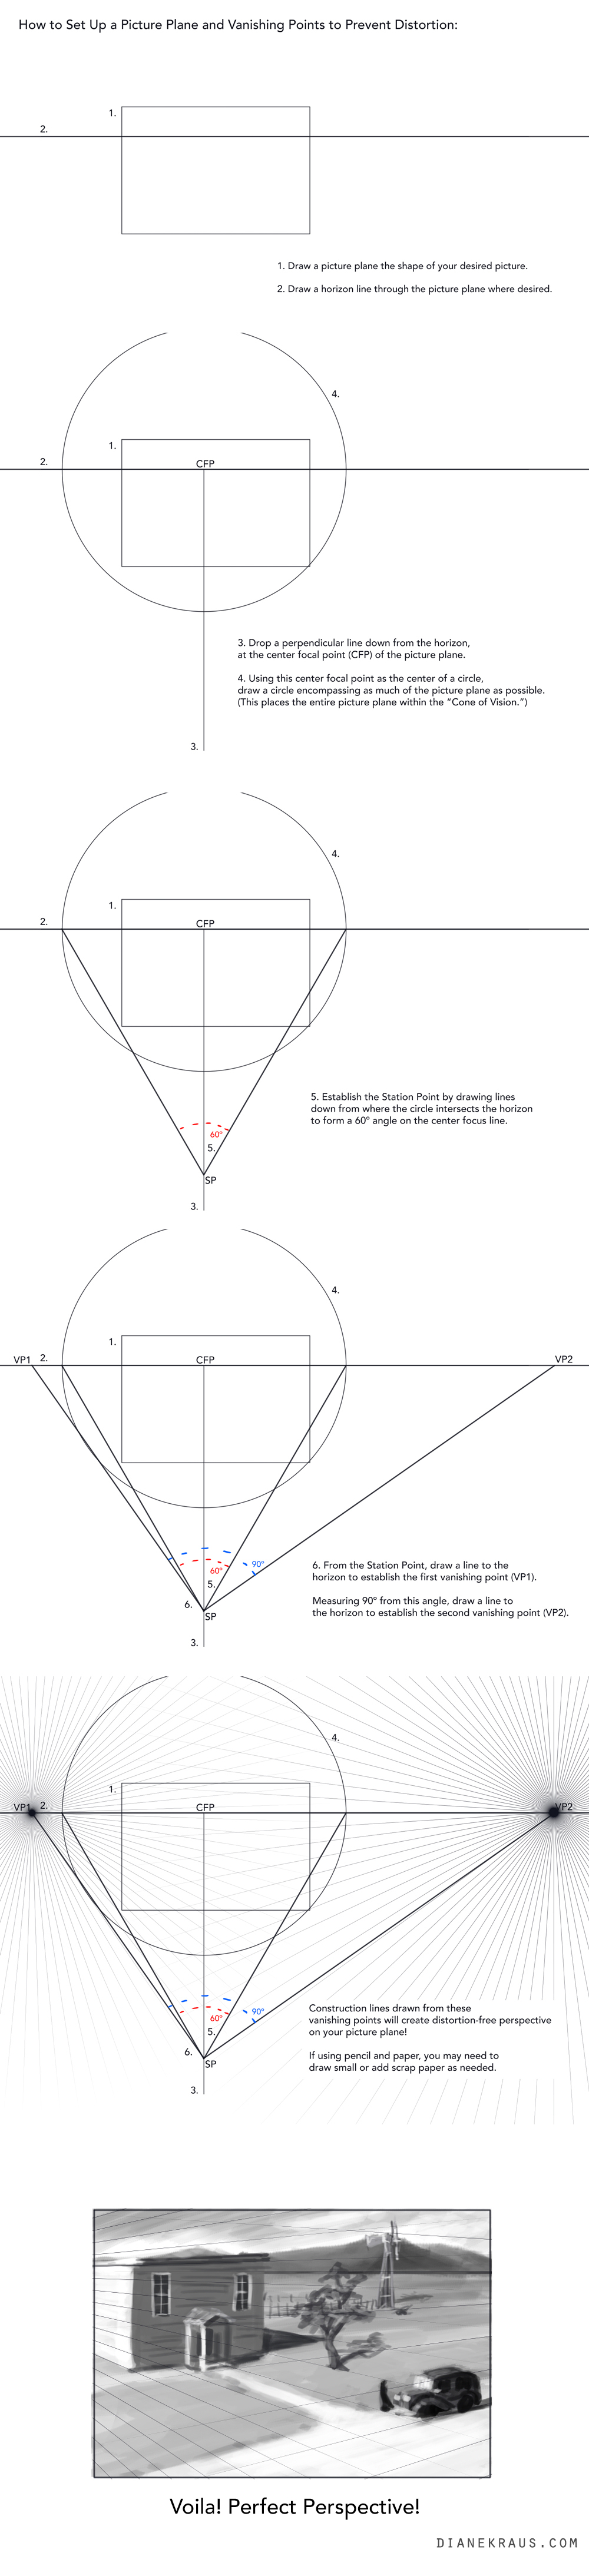 Setting up Vanishing Points Tutorial by HJWinn deviantart